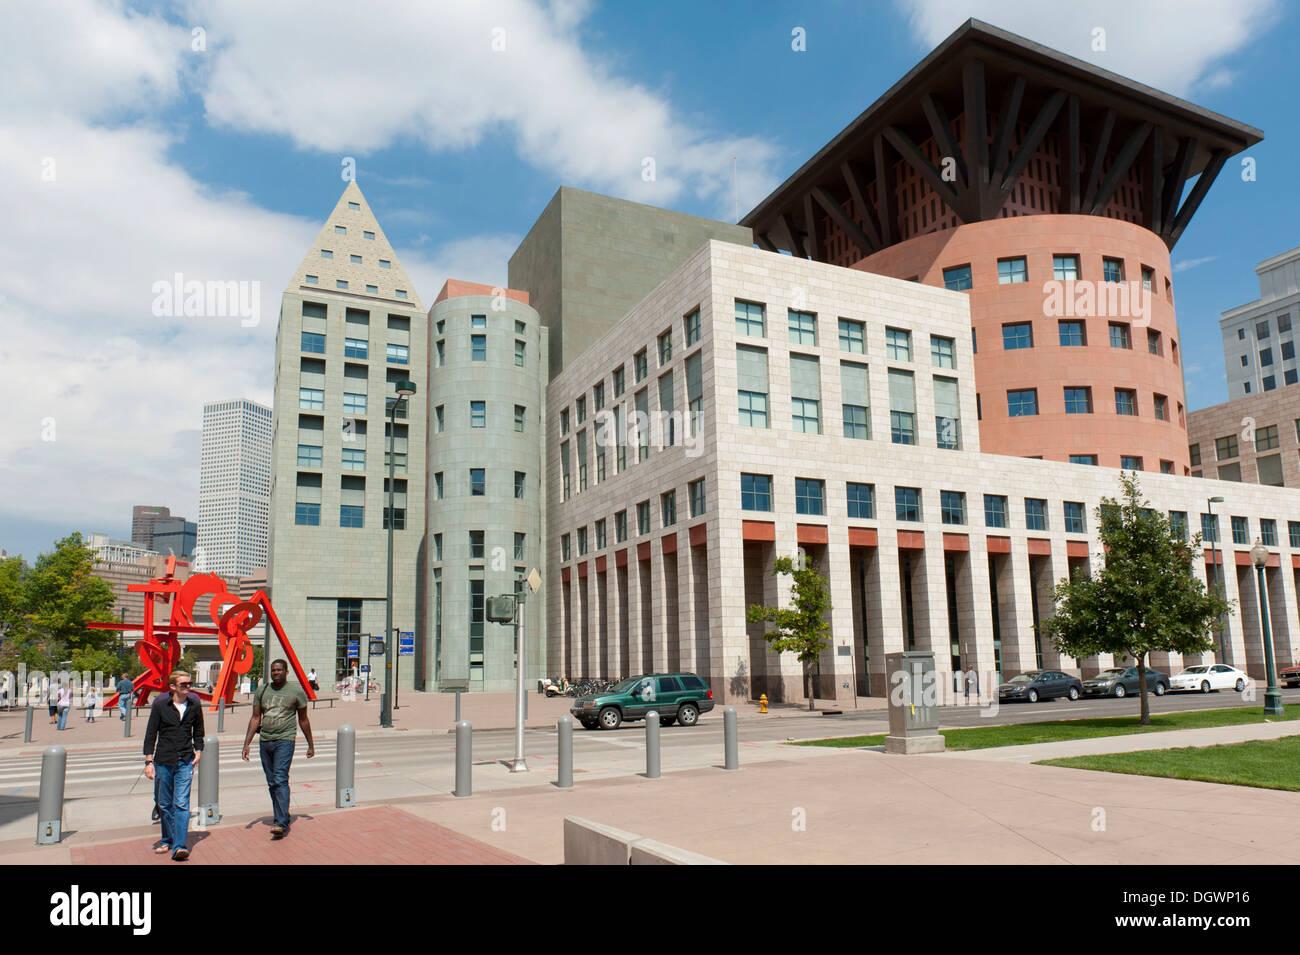 Library, modern architecture, Civic Center, Denver, Colorado, Western United States, United States of America, North America - Stock Image